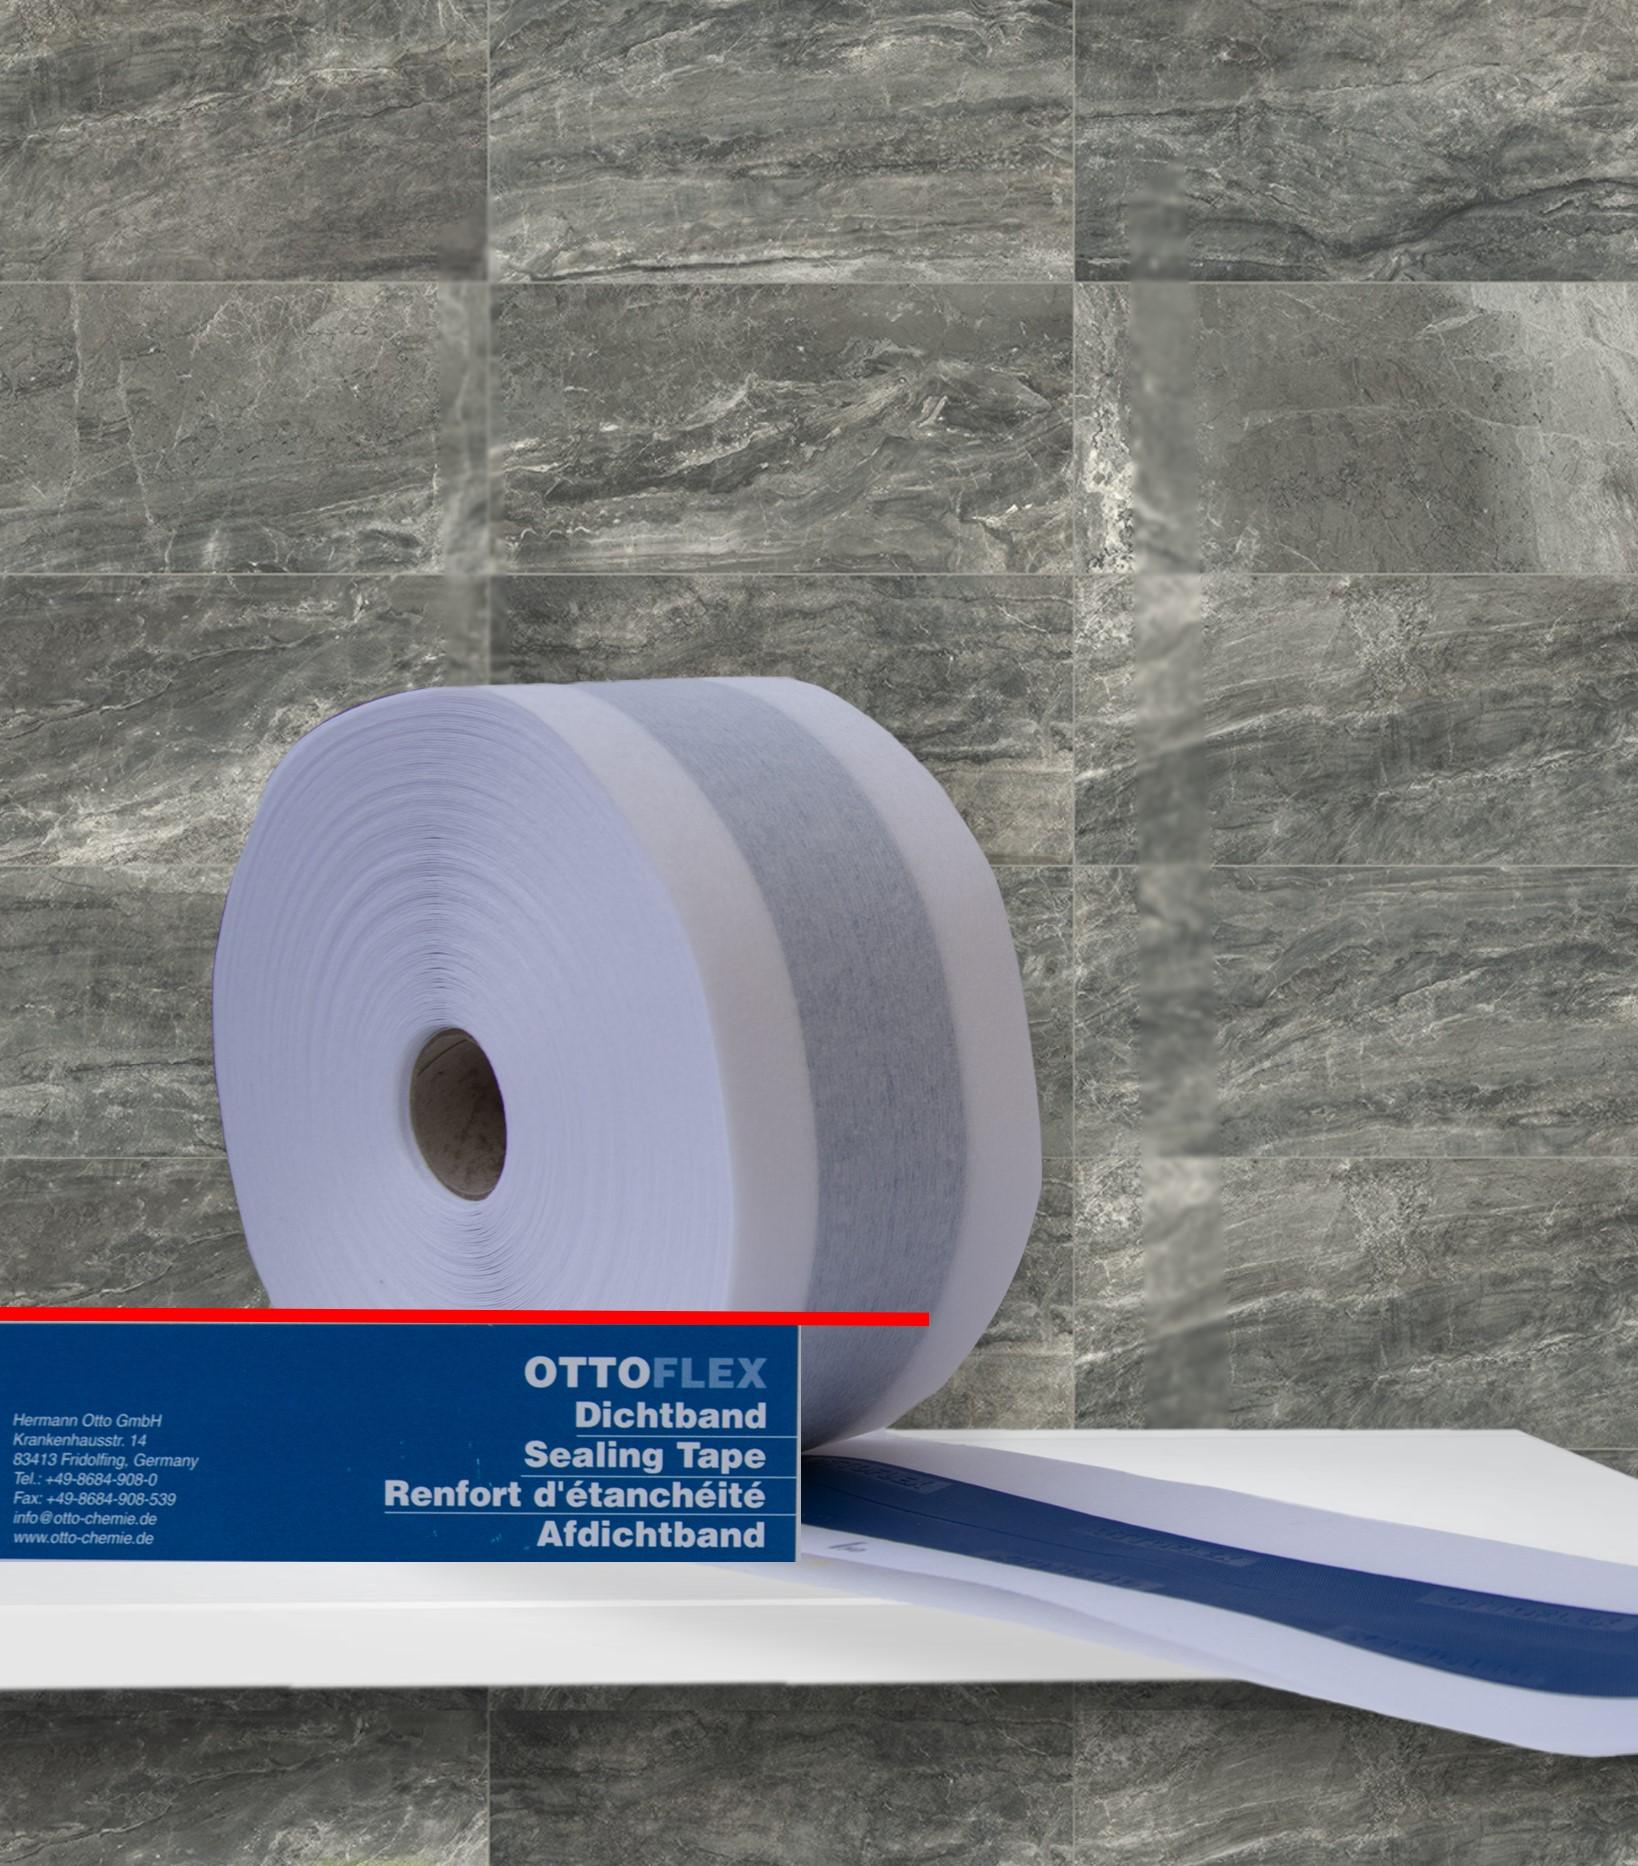 OTTOFLEX Objektdichtband 50m Rolle